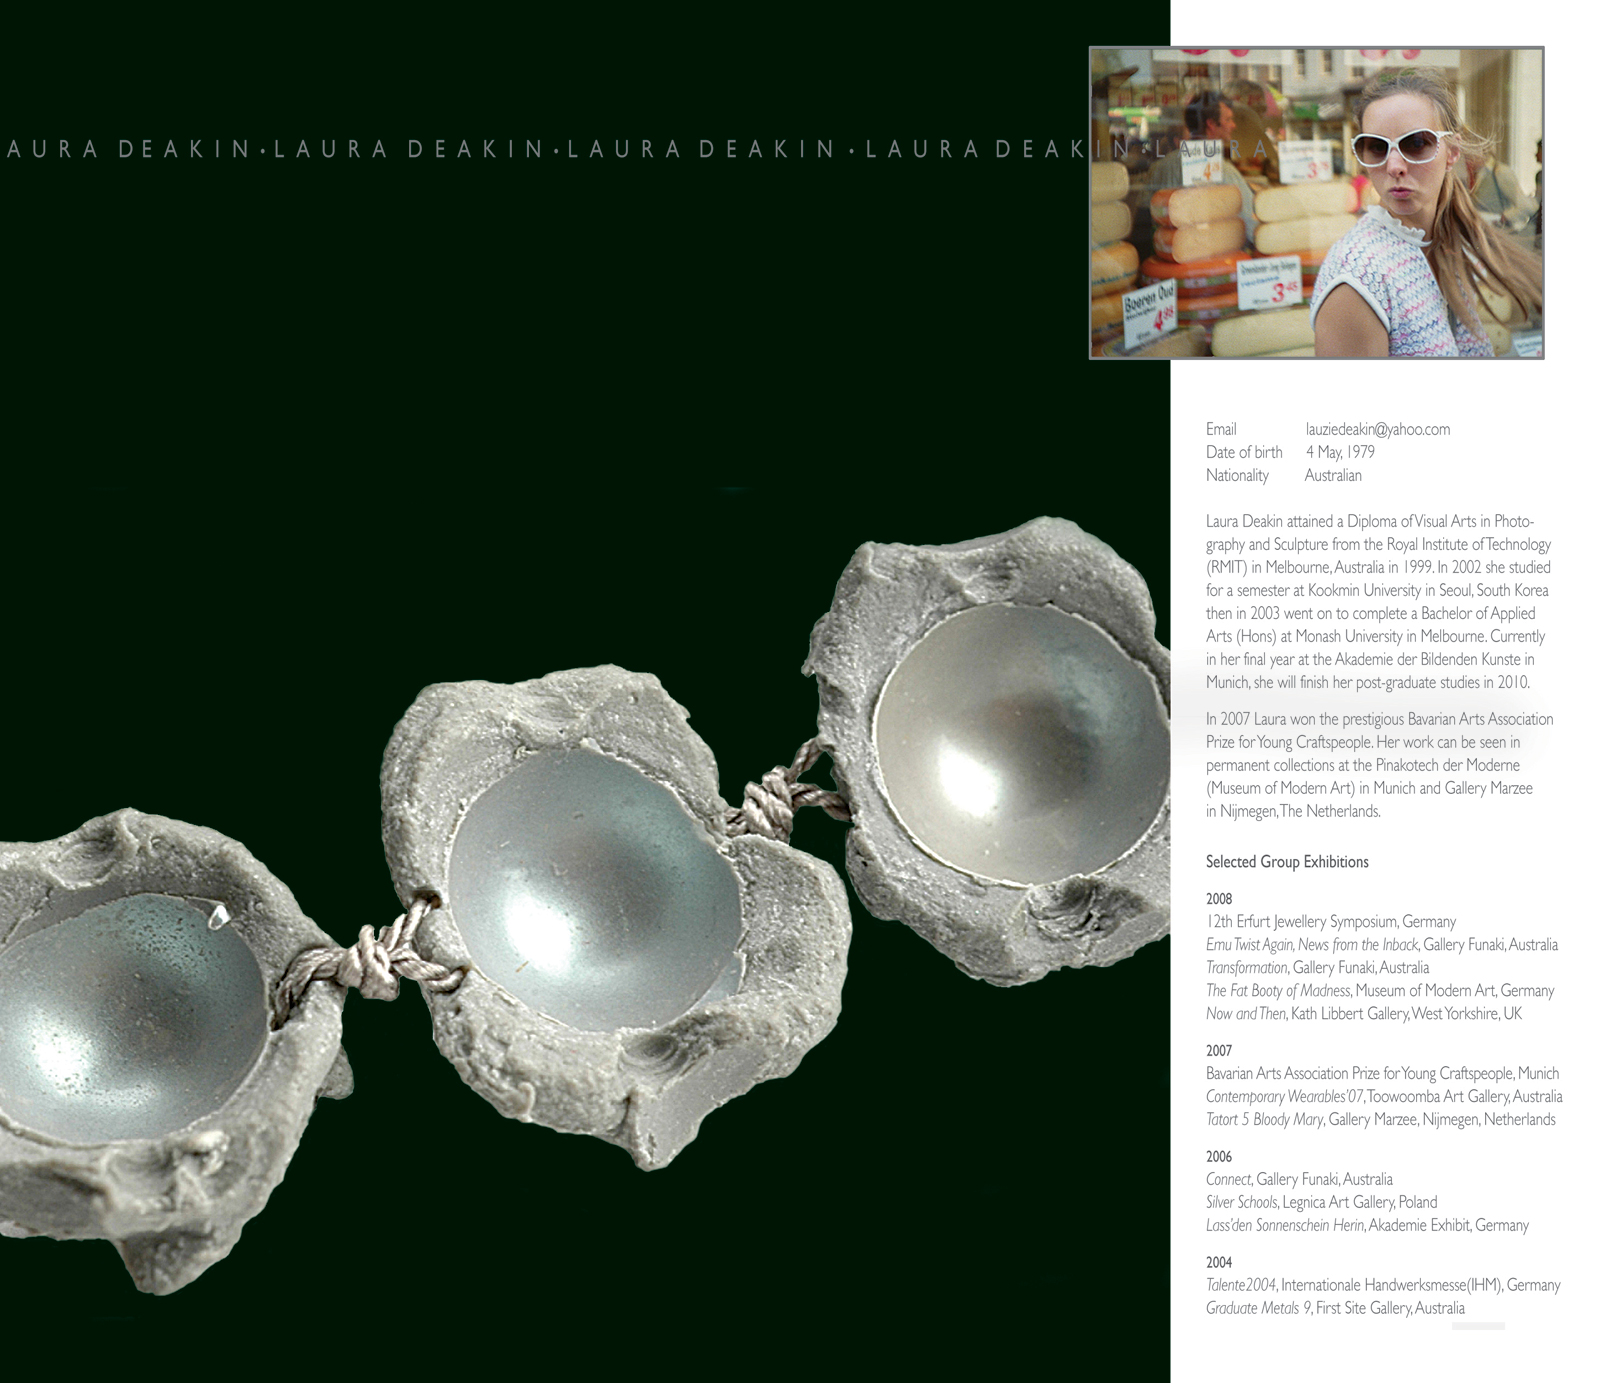 2008-Compendium-2008-Finale-of-Contemporary-Jewellers-Pg1.jpg